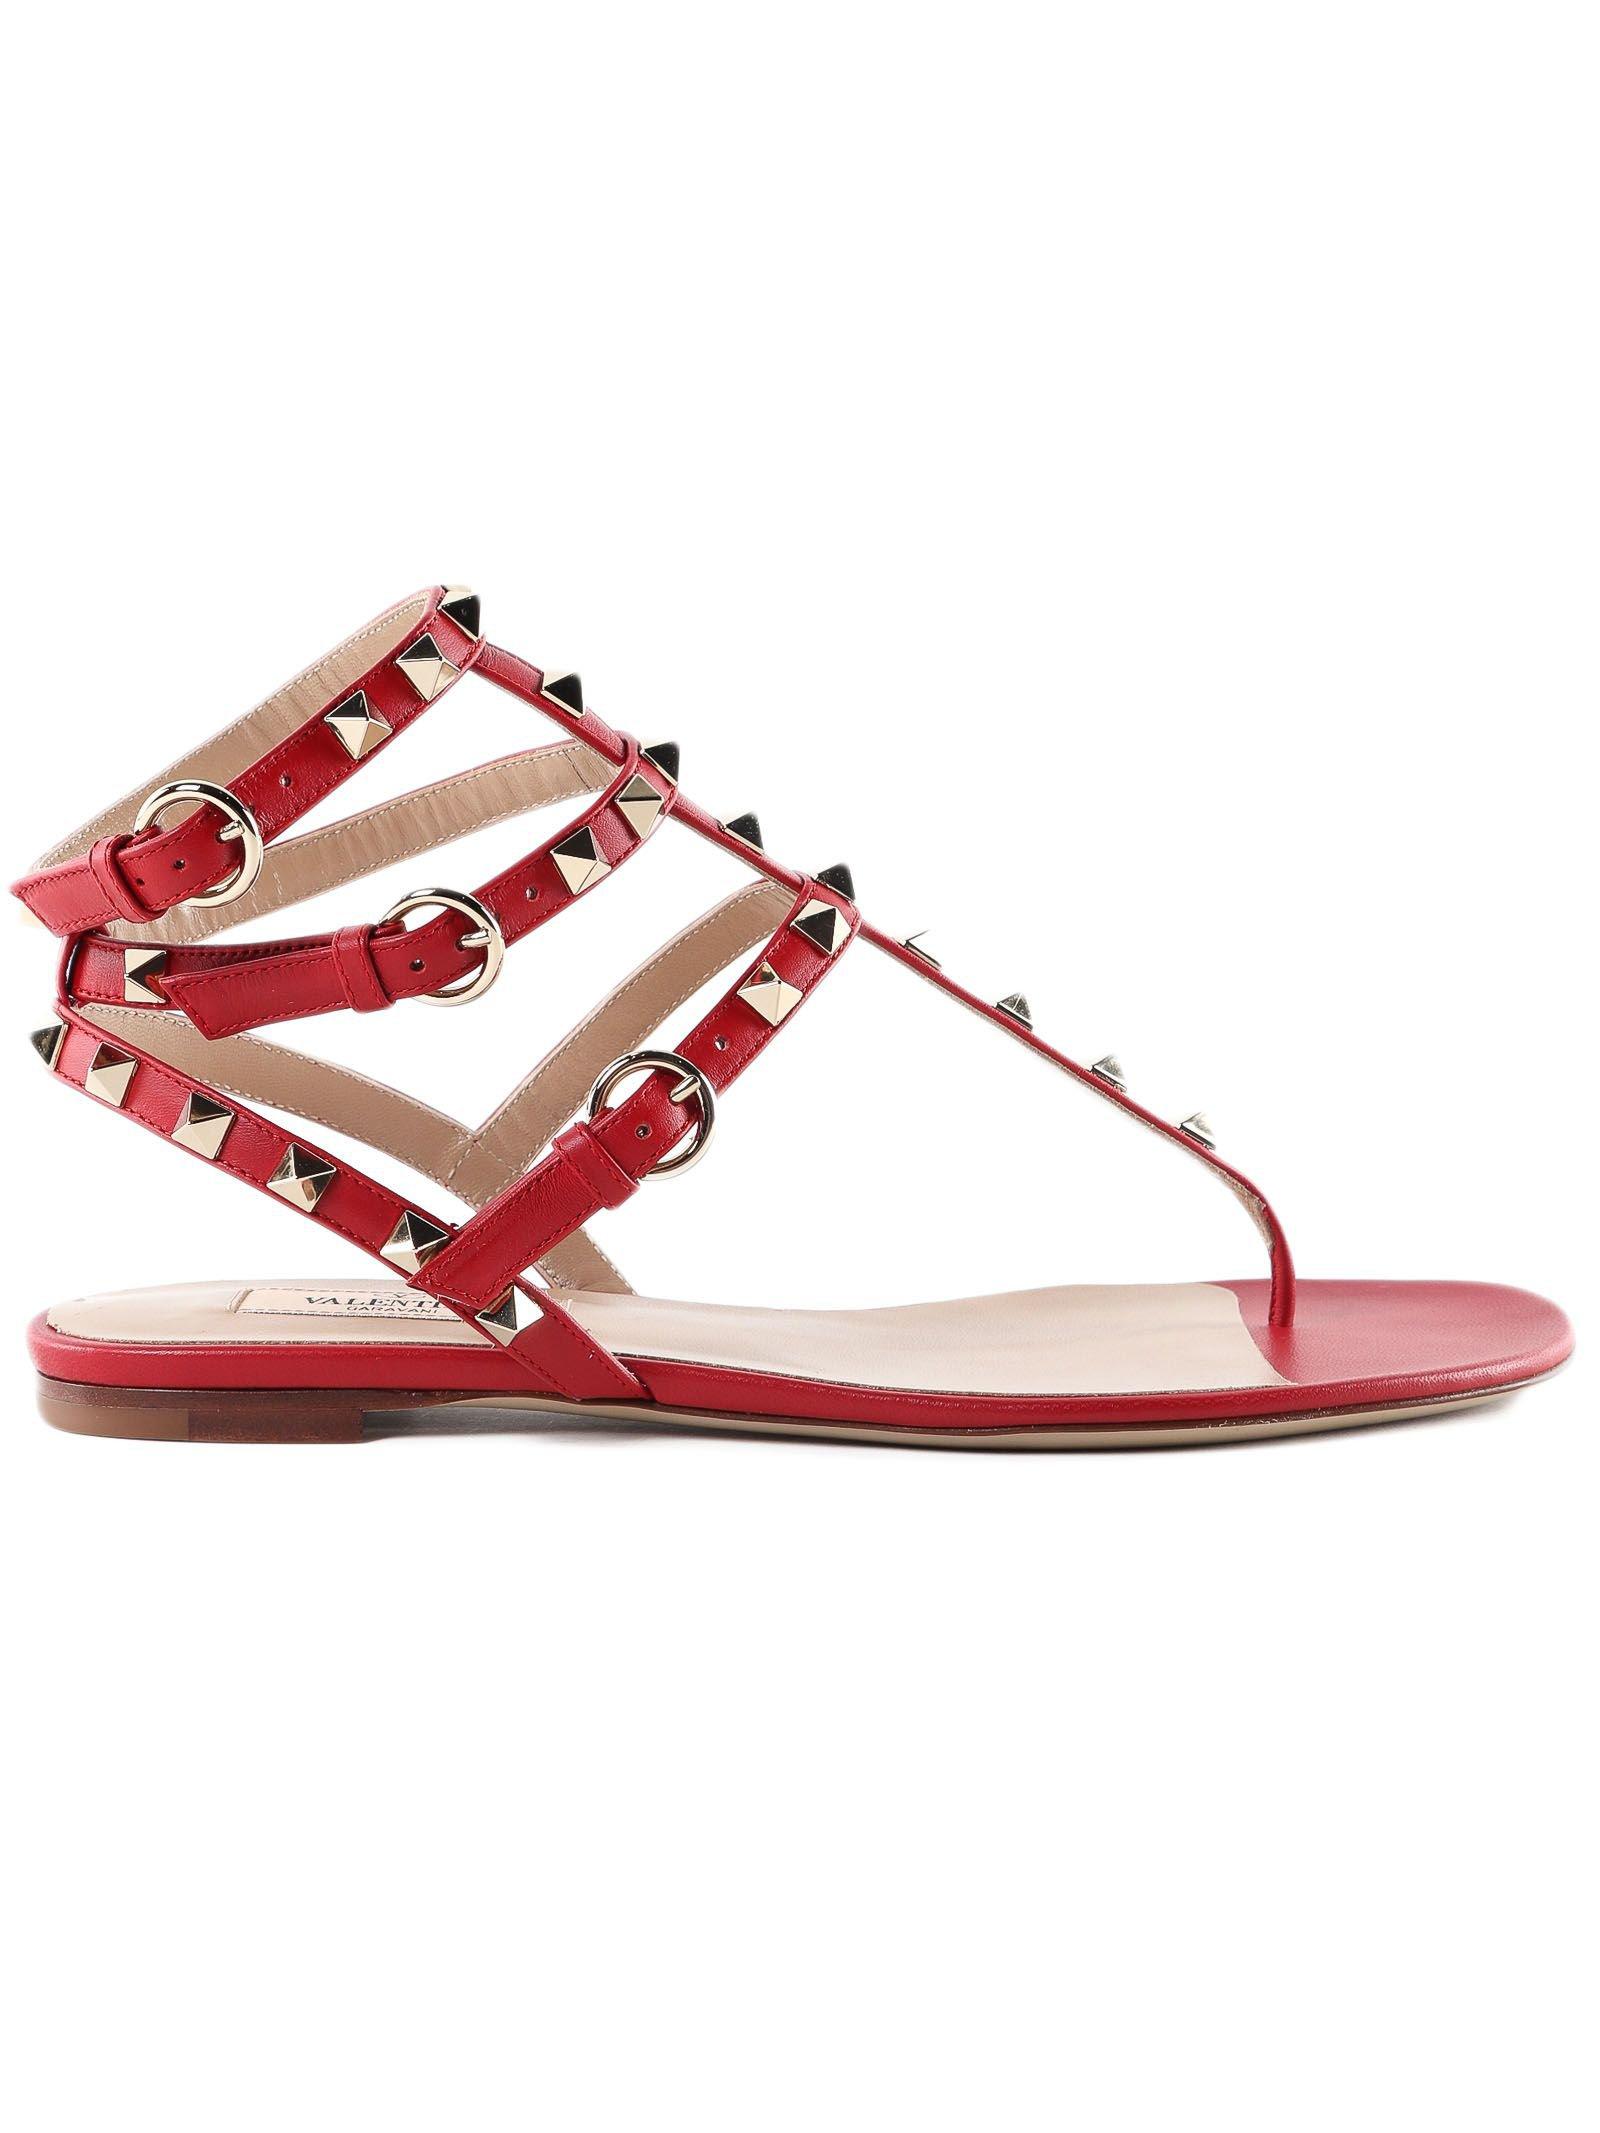 Valentino Garavani Rockstud Sandals